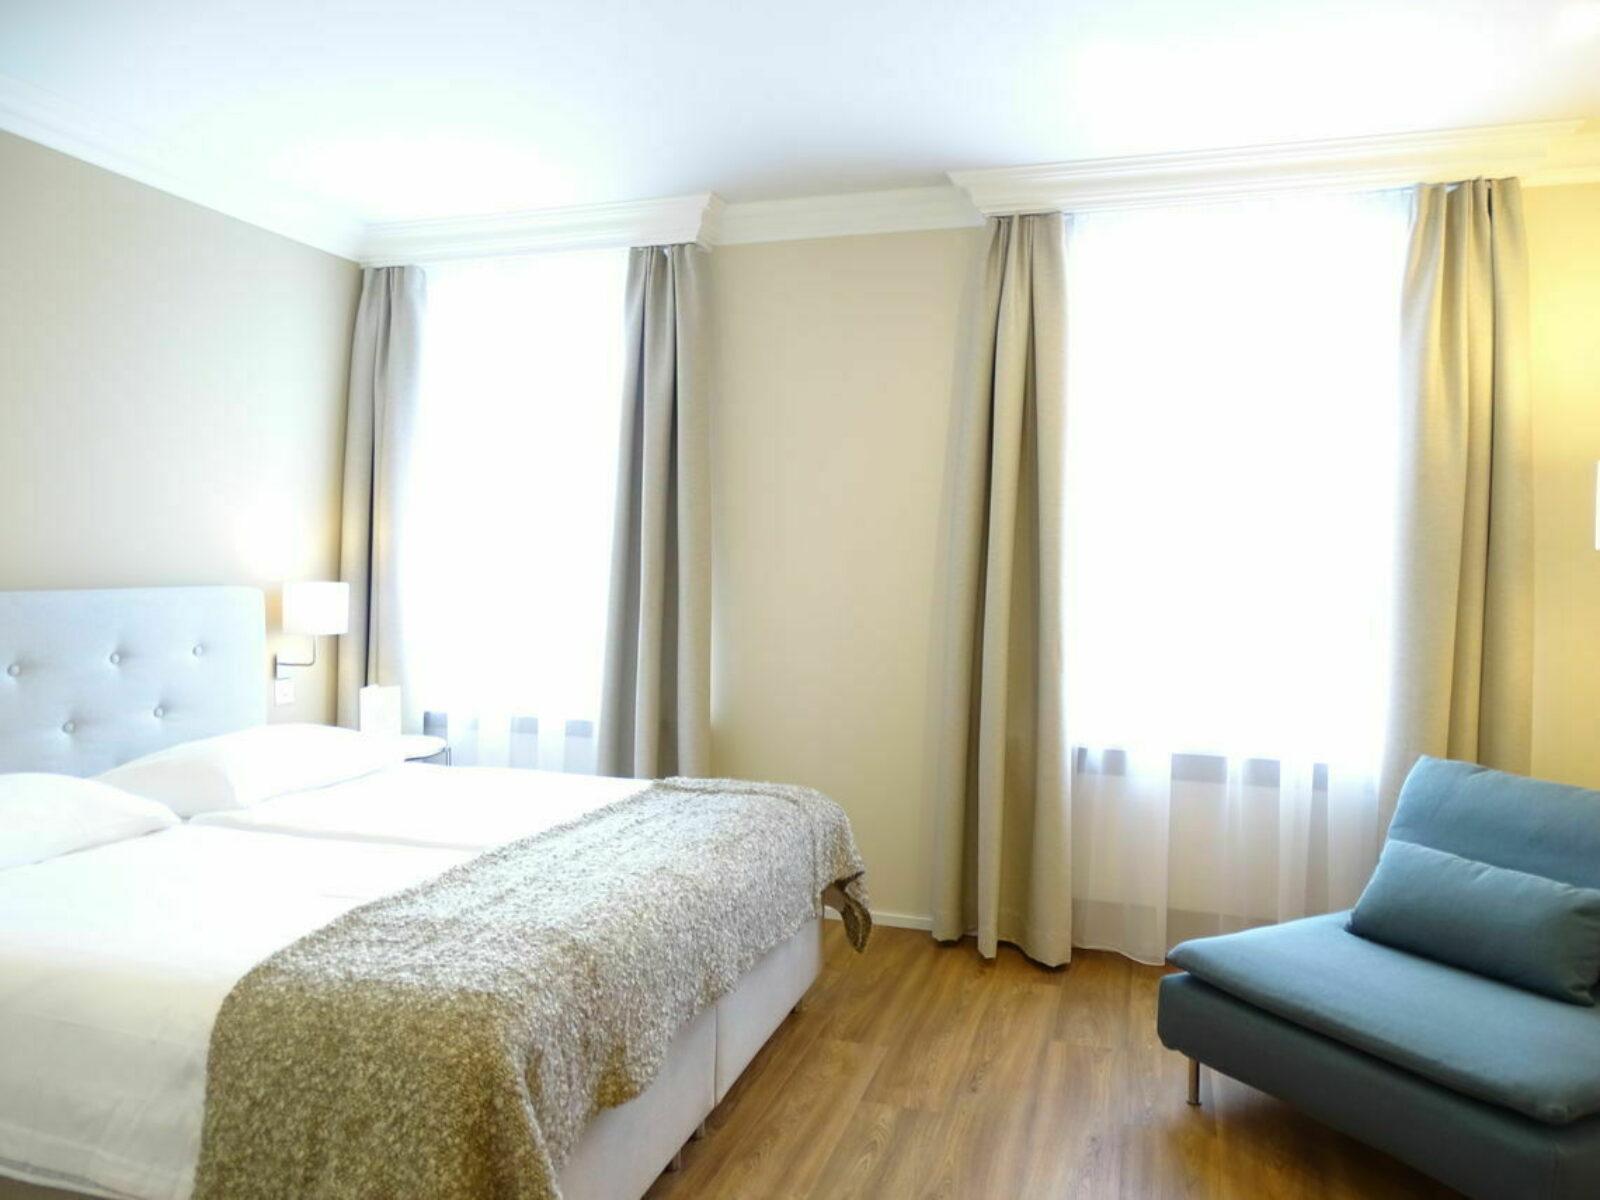 Zimmer Hotel Bad Eptingen 2